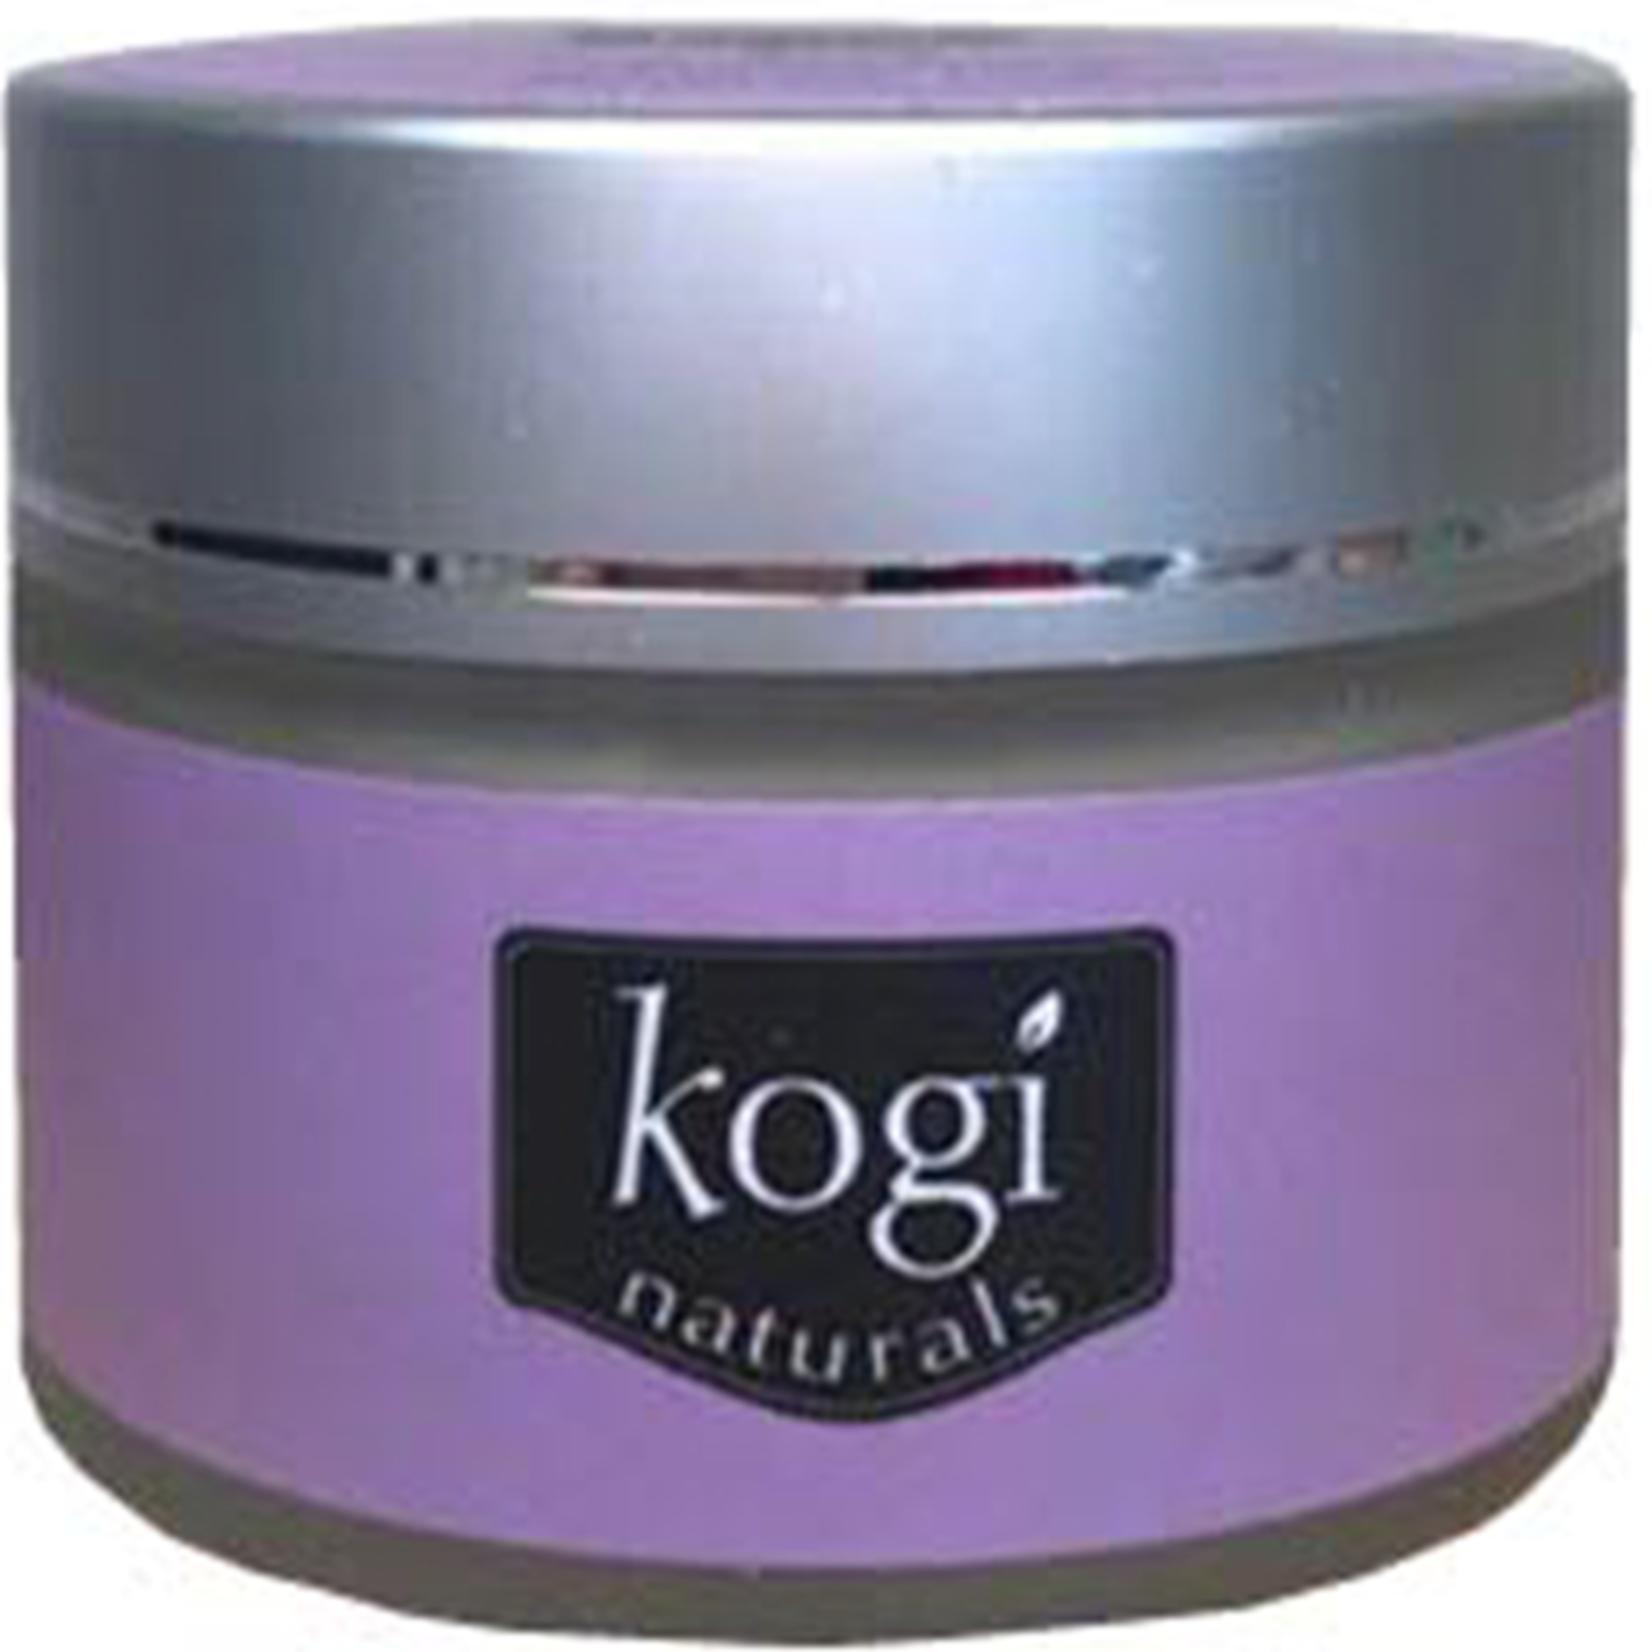 Kogi Naturals Kogi natural Cream Deodorant